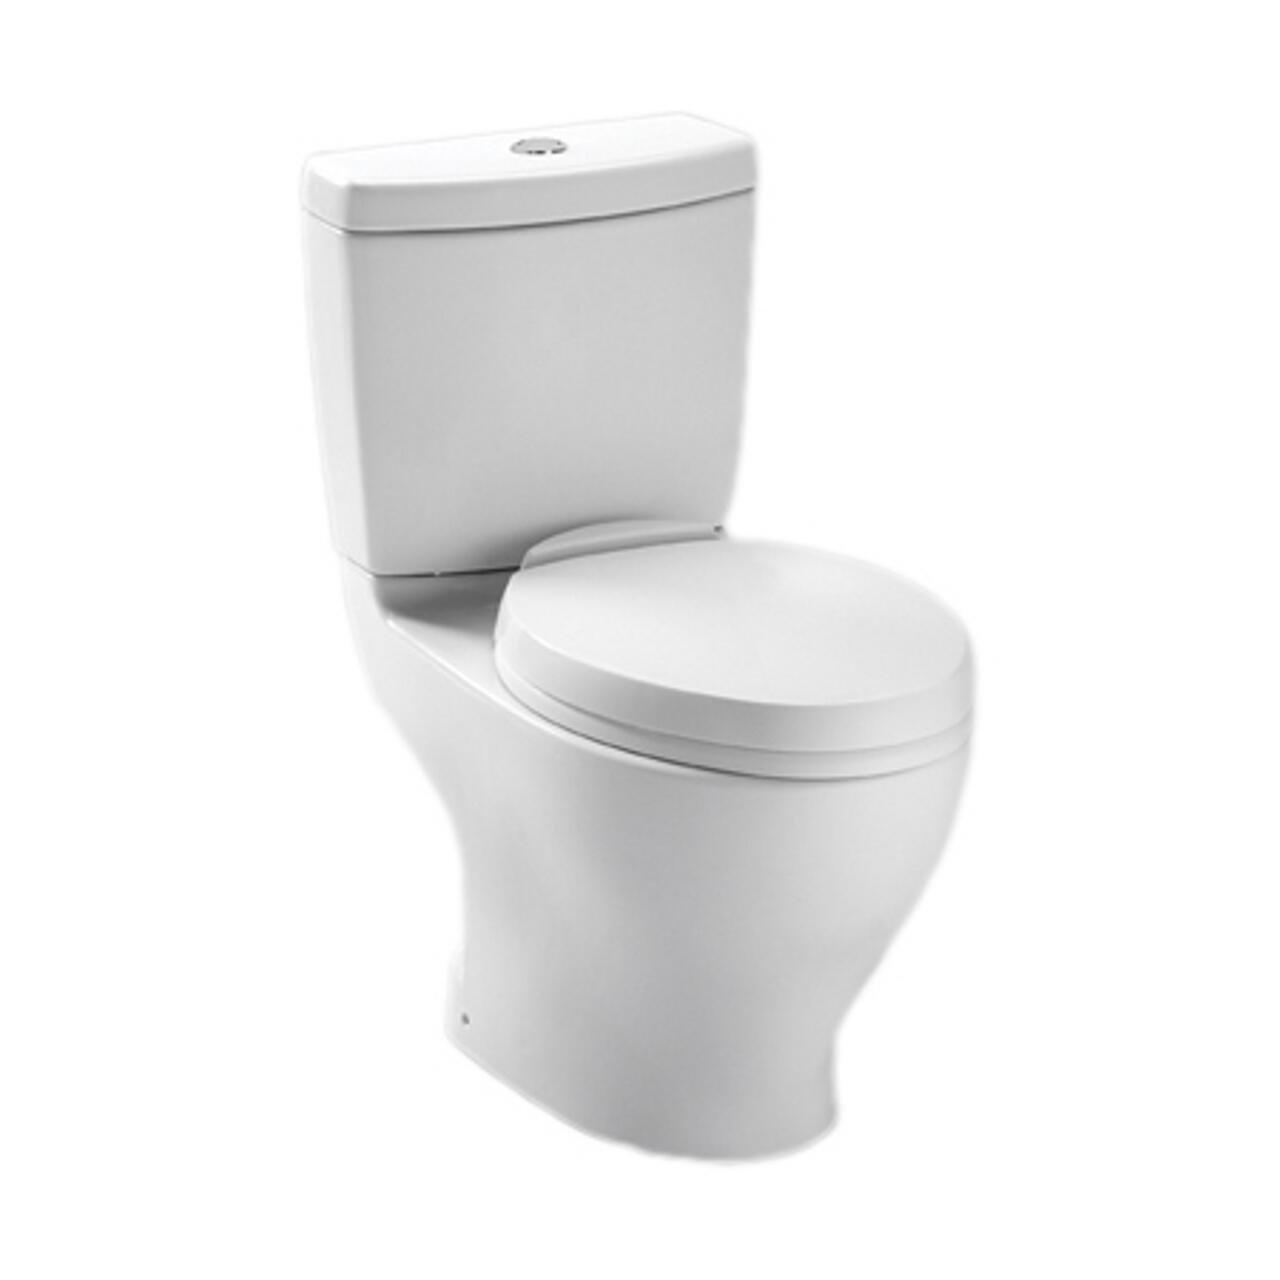 TOTO CST412MF.01 Aquia Dual Flush Elongated Toilet